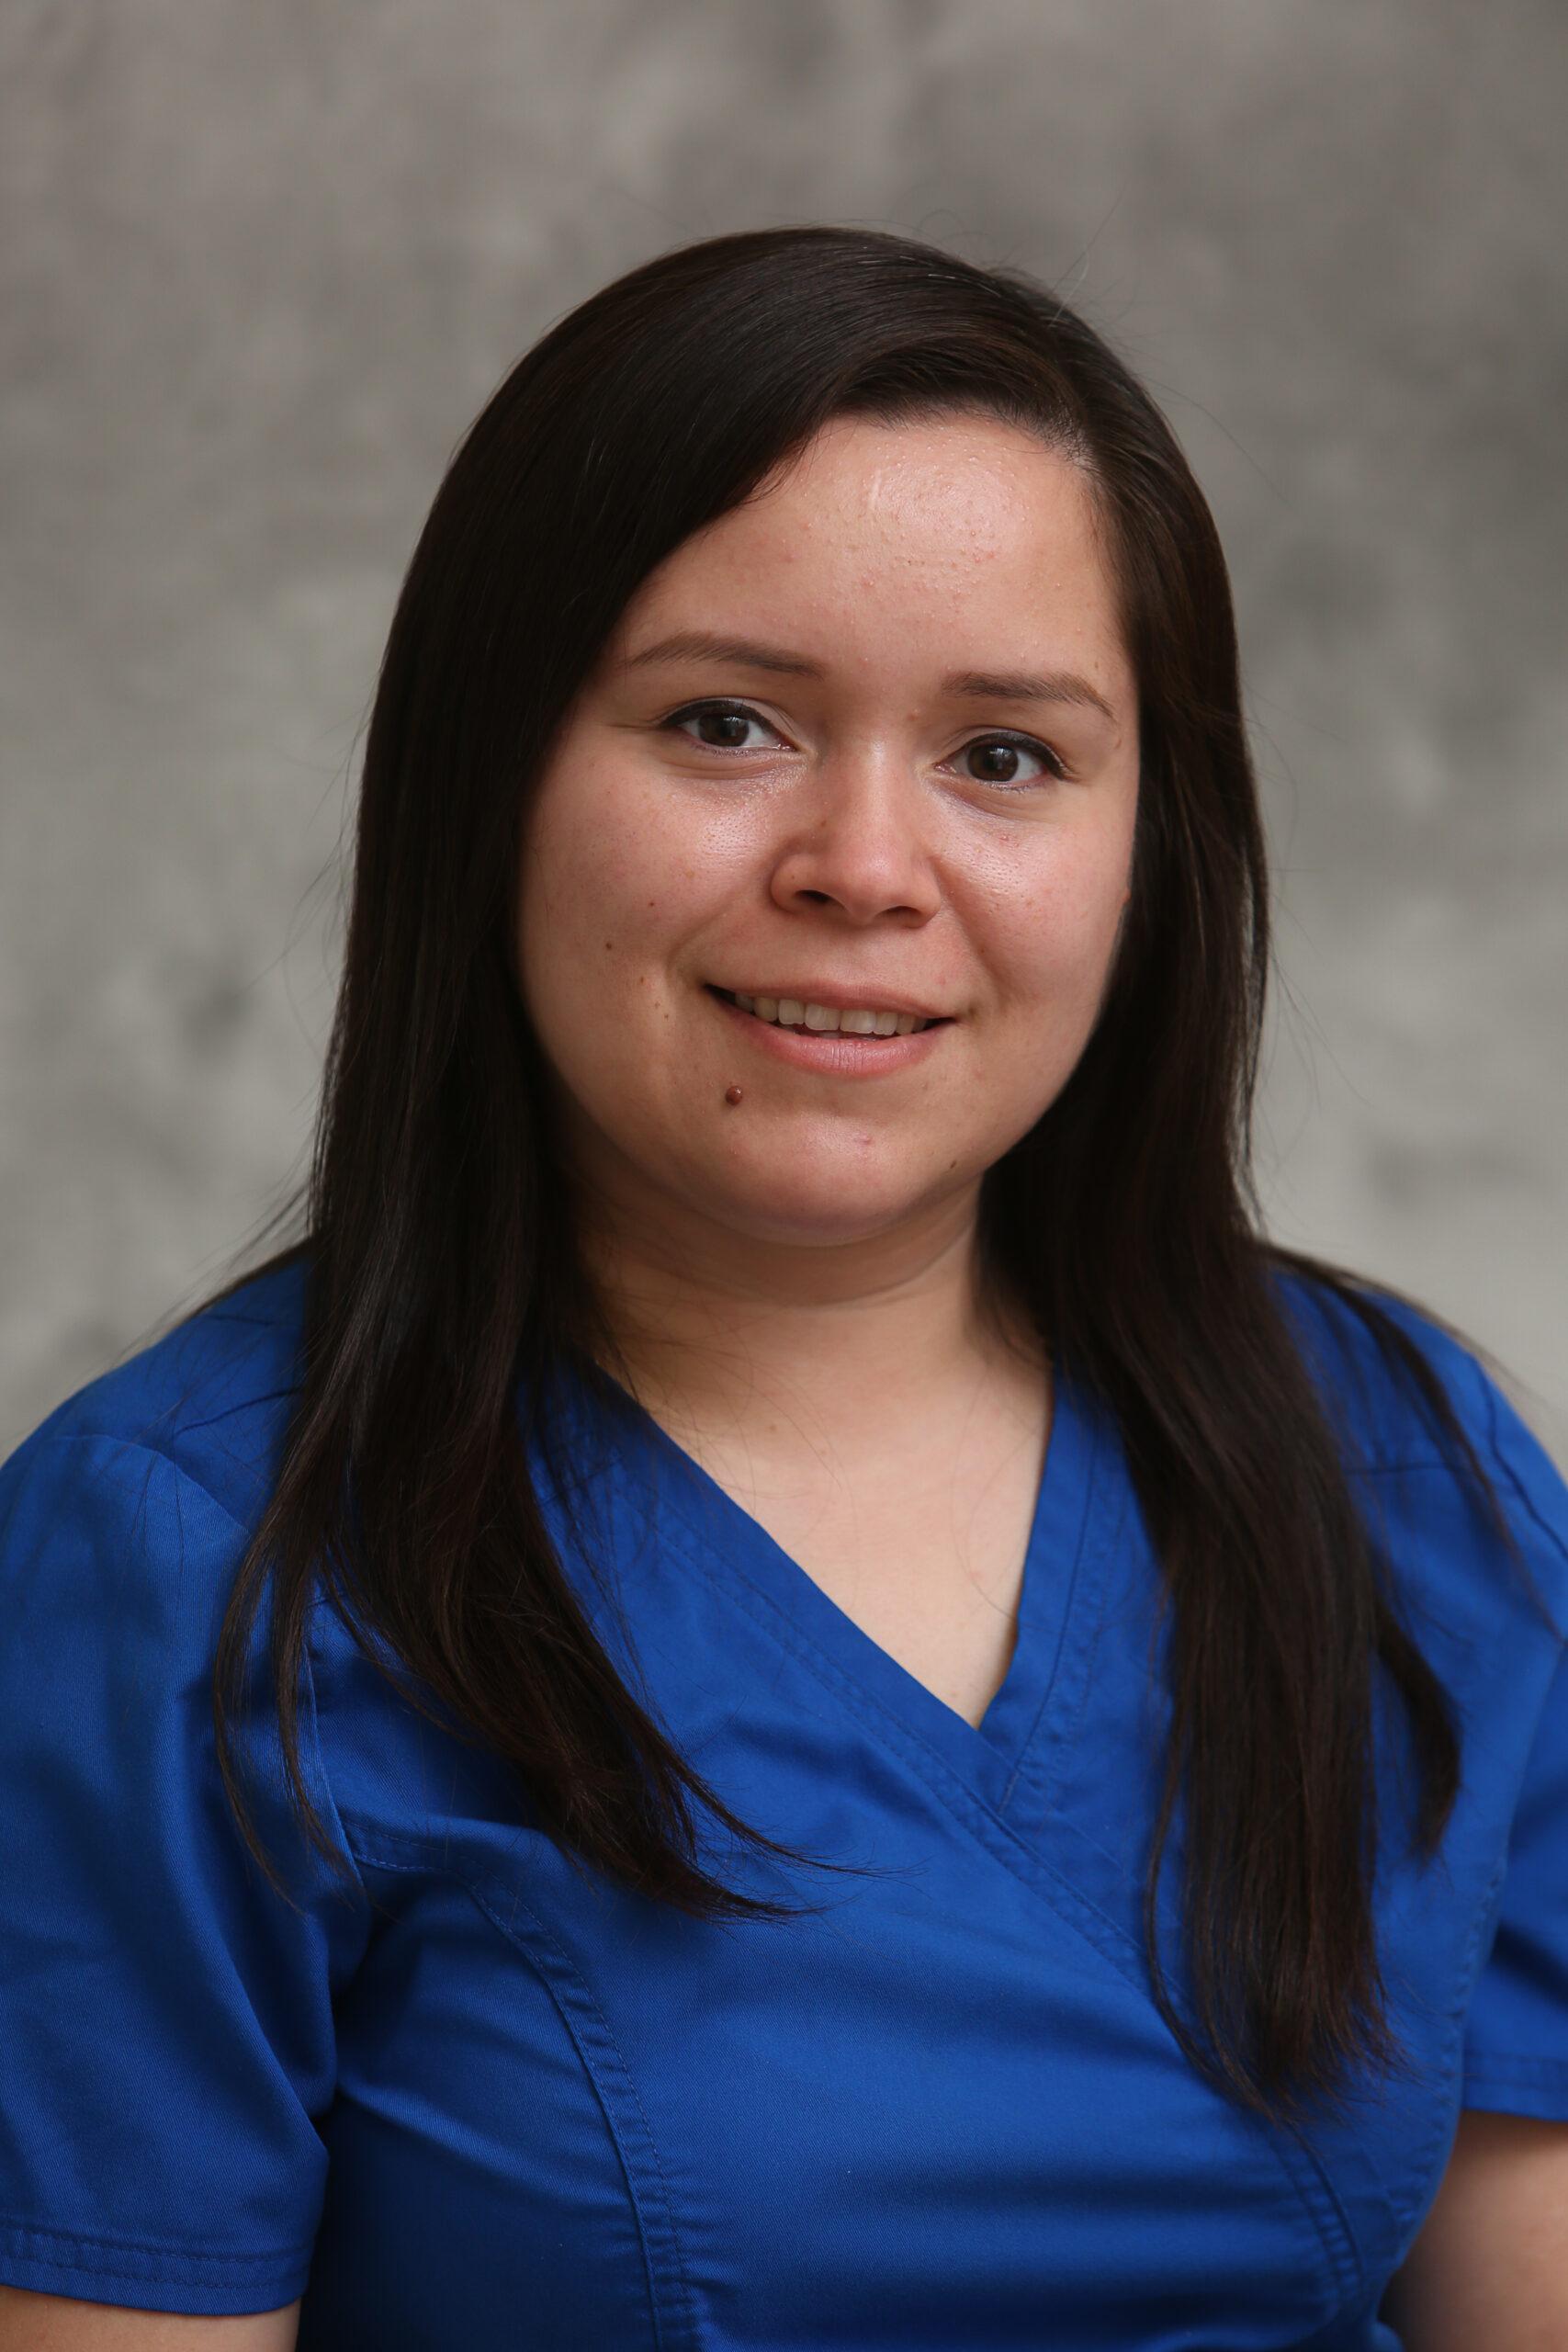 Cristel, LPN - Prenatal and Women's Health